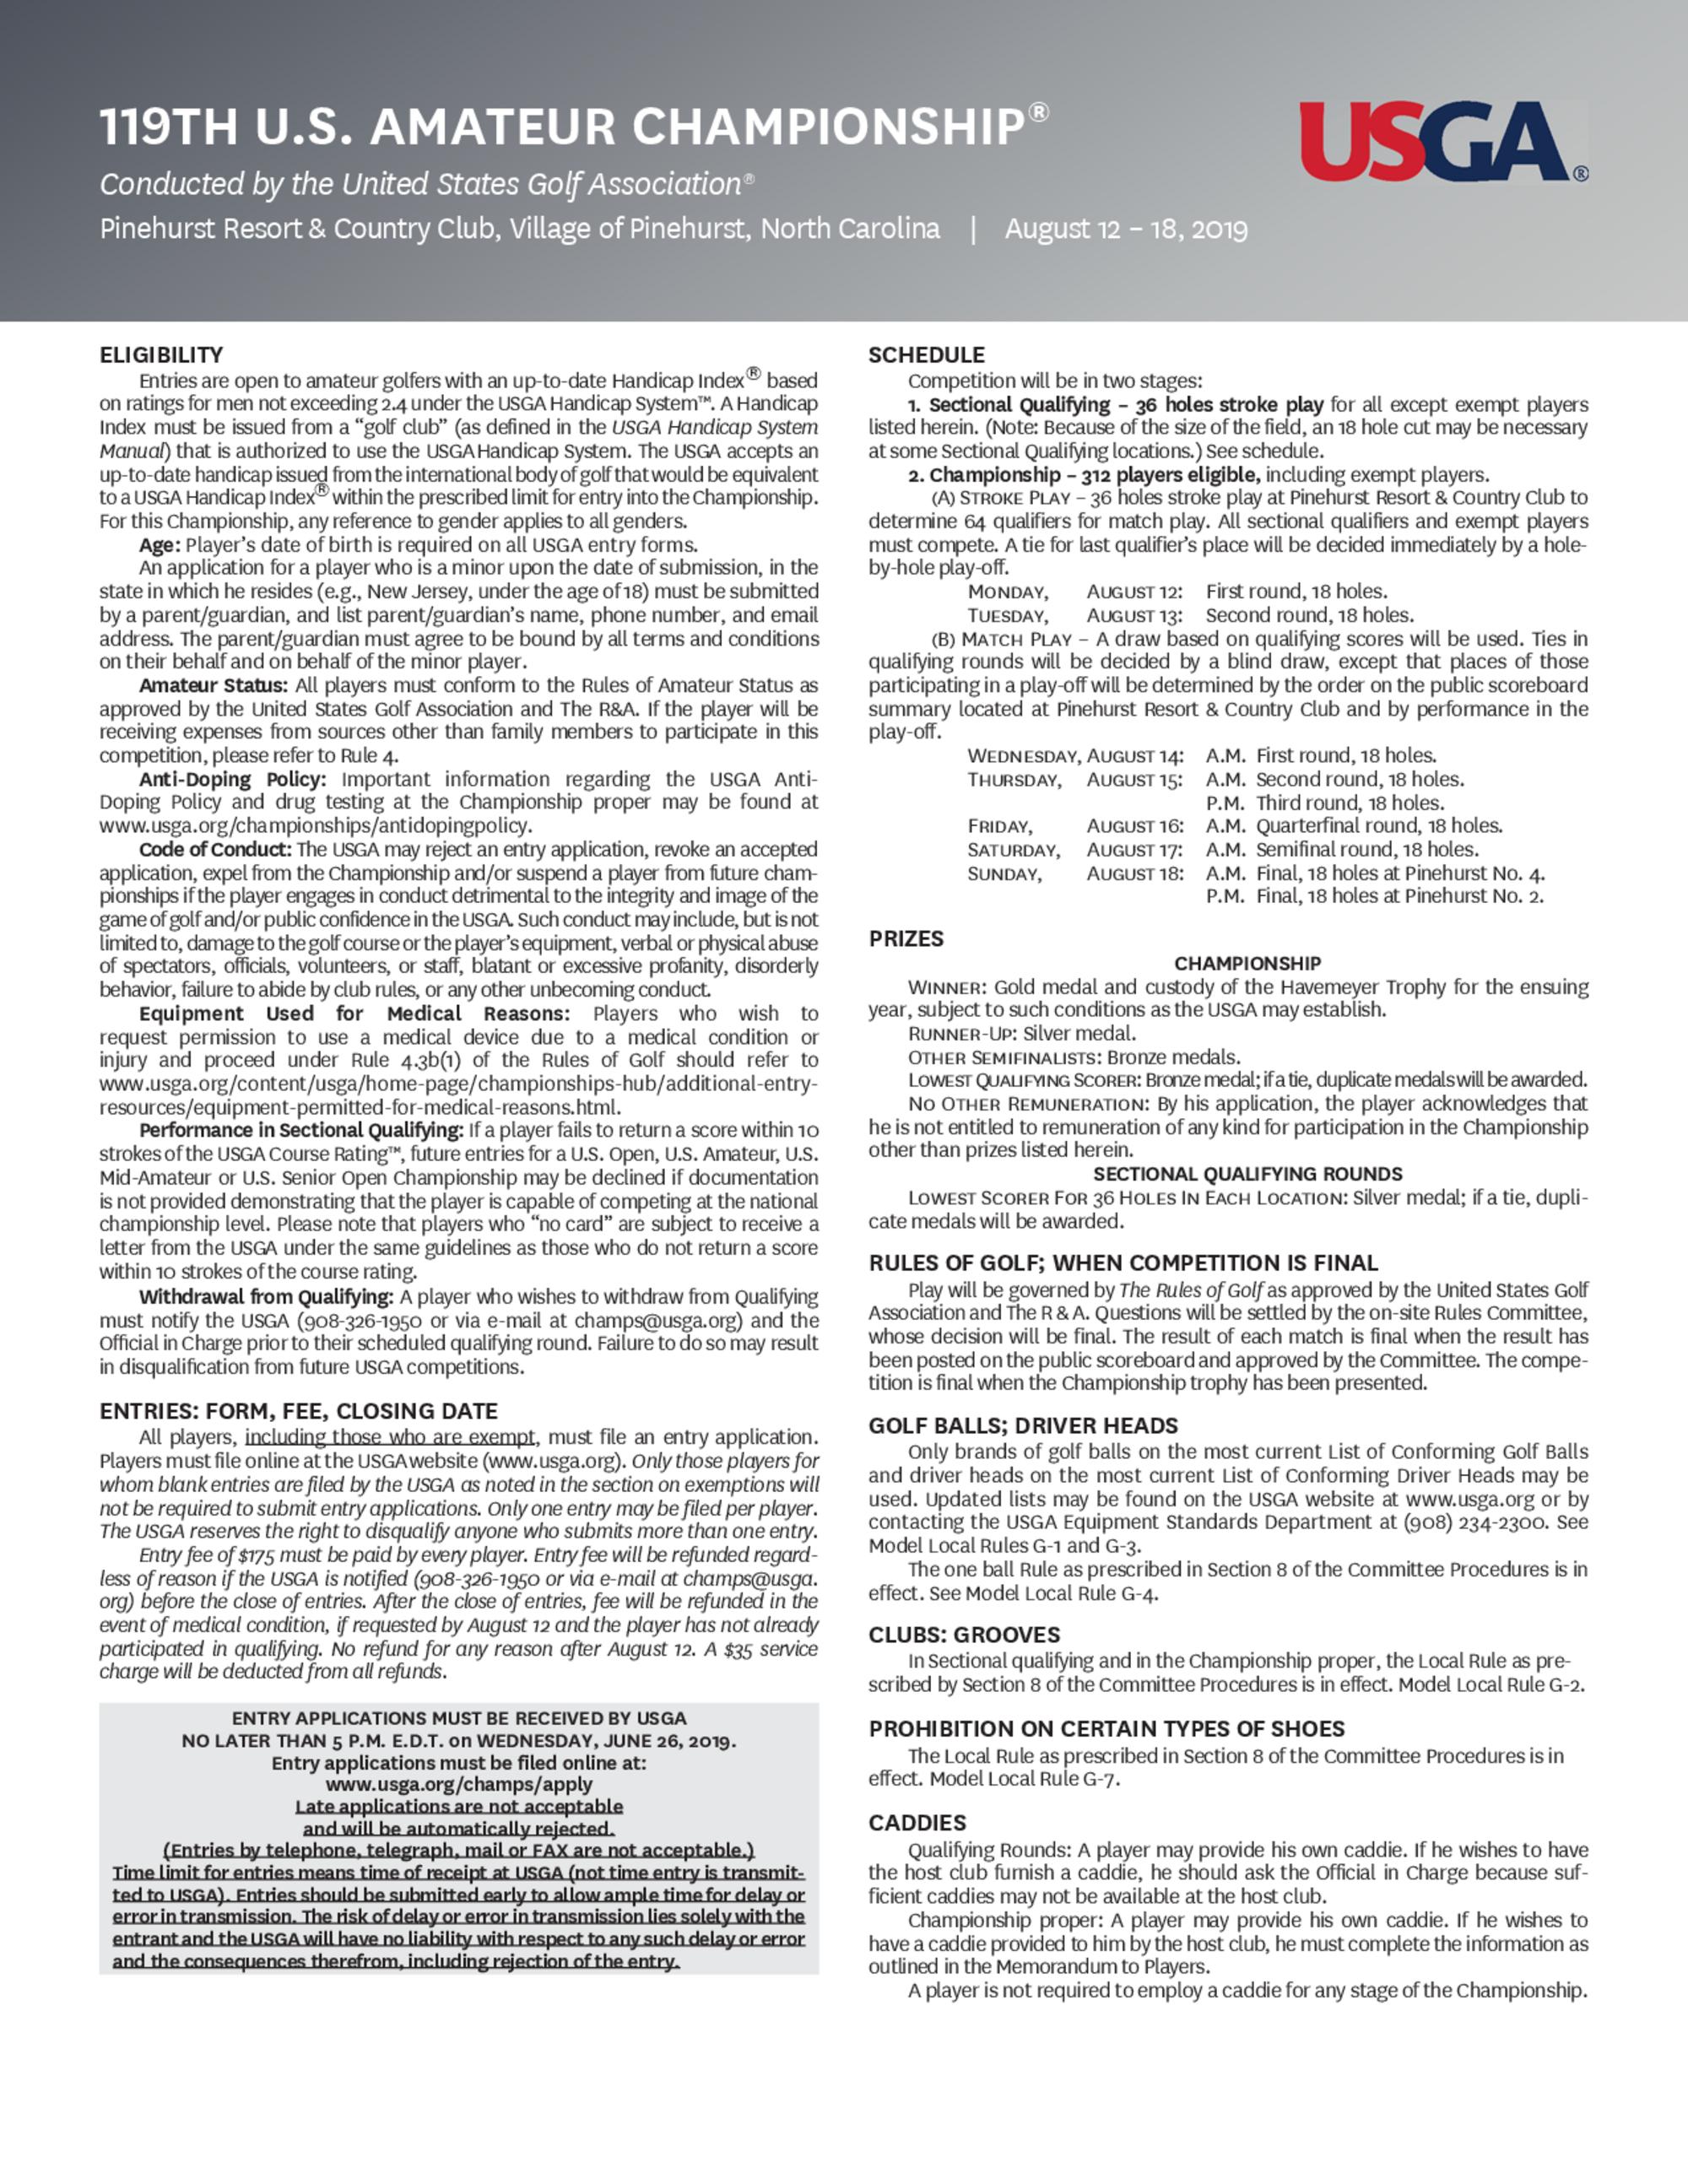 2019 u.s. amateur pdf 1